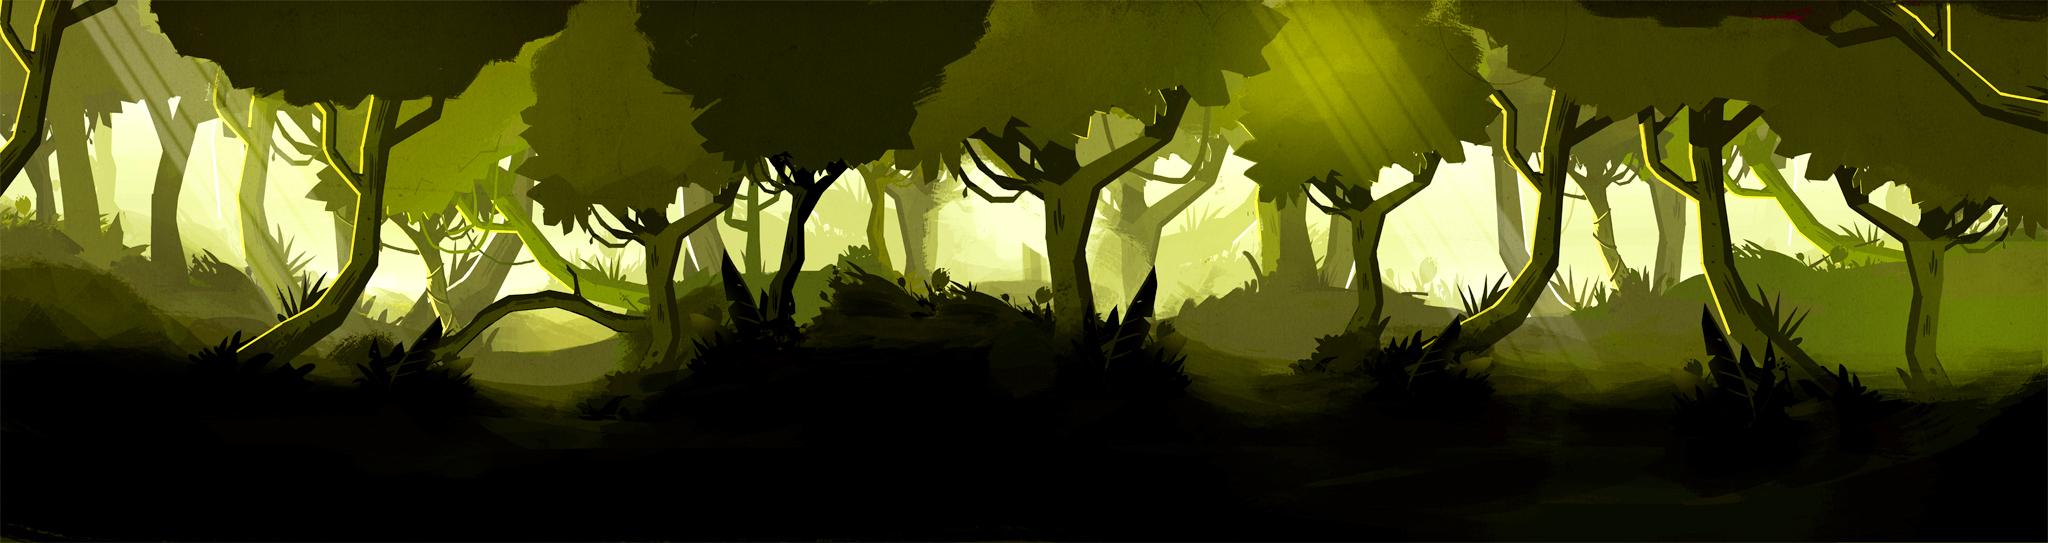 Jungle Basic sml.jpg